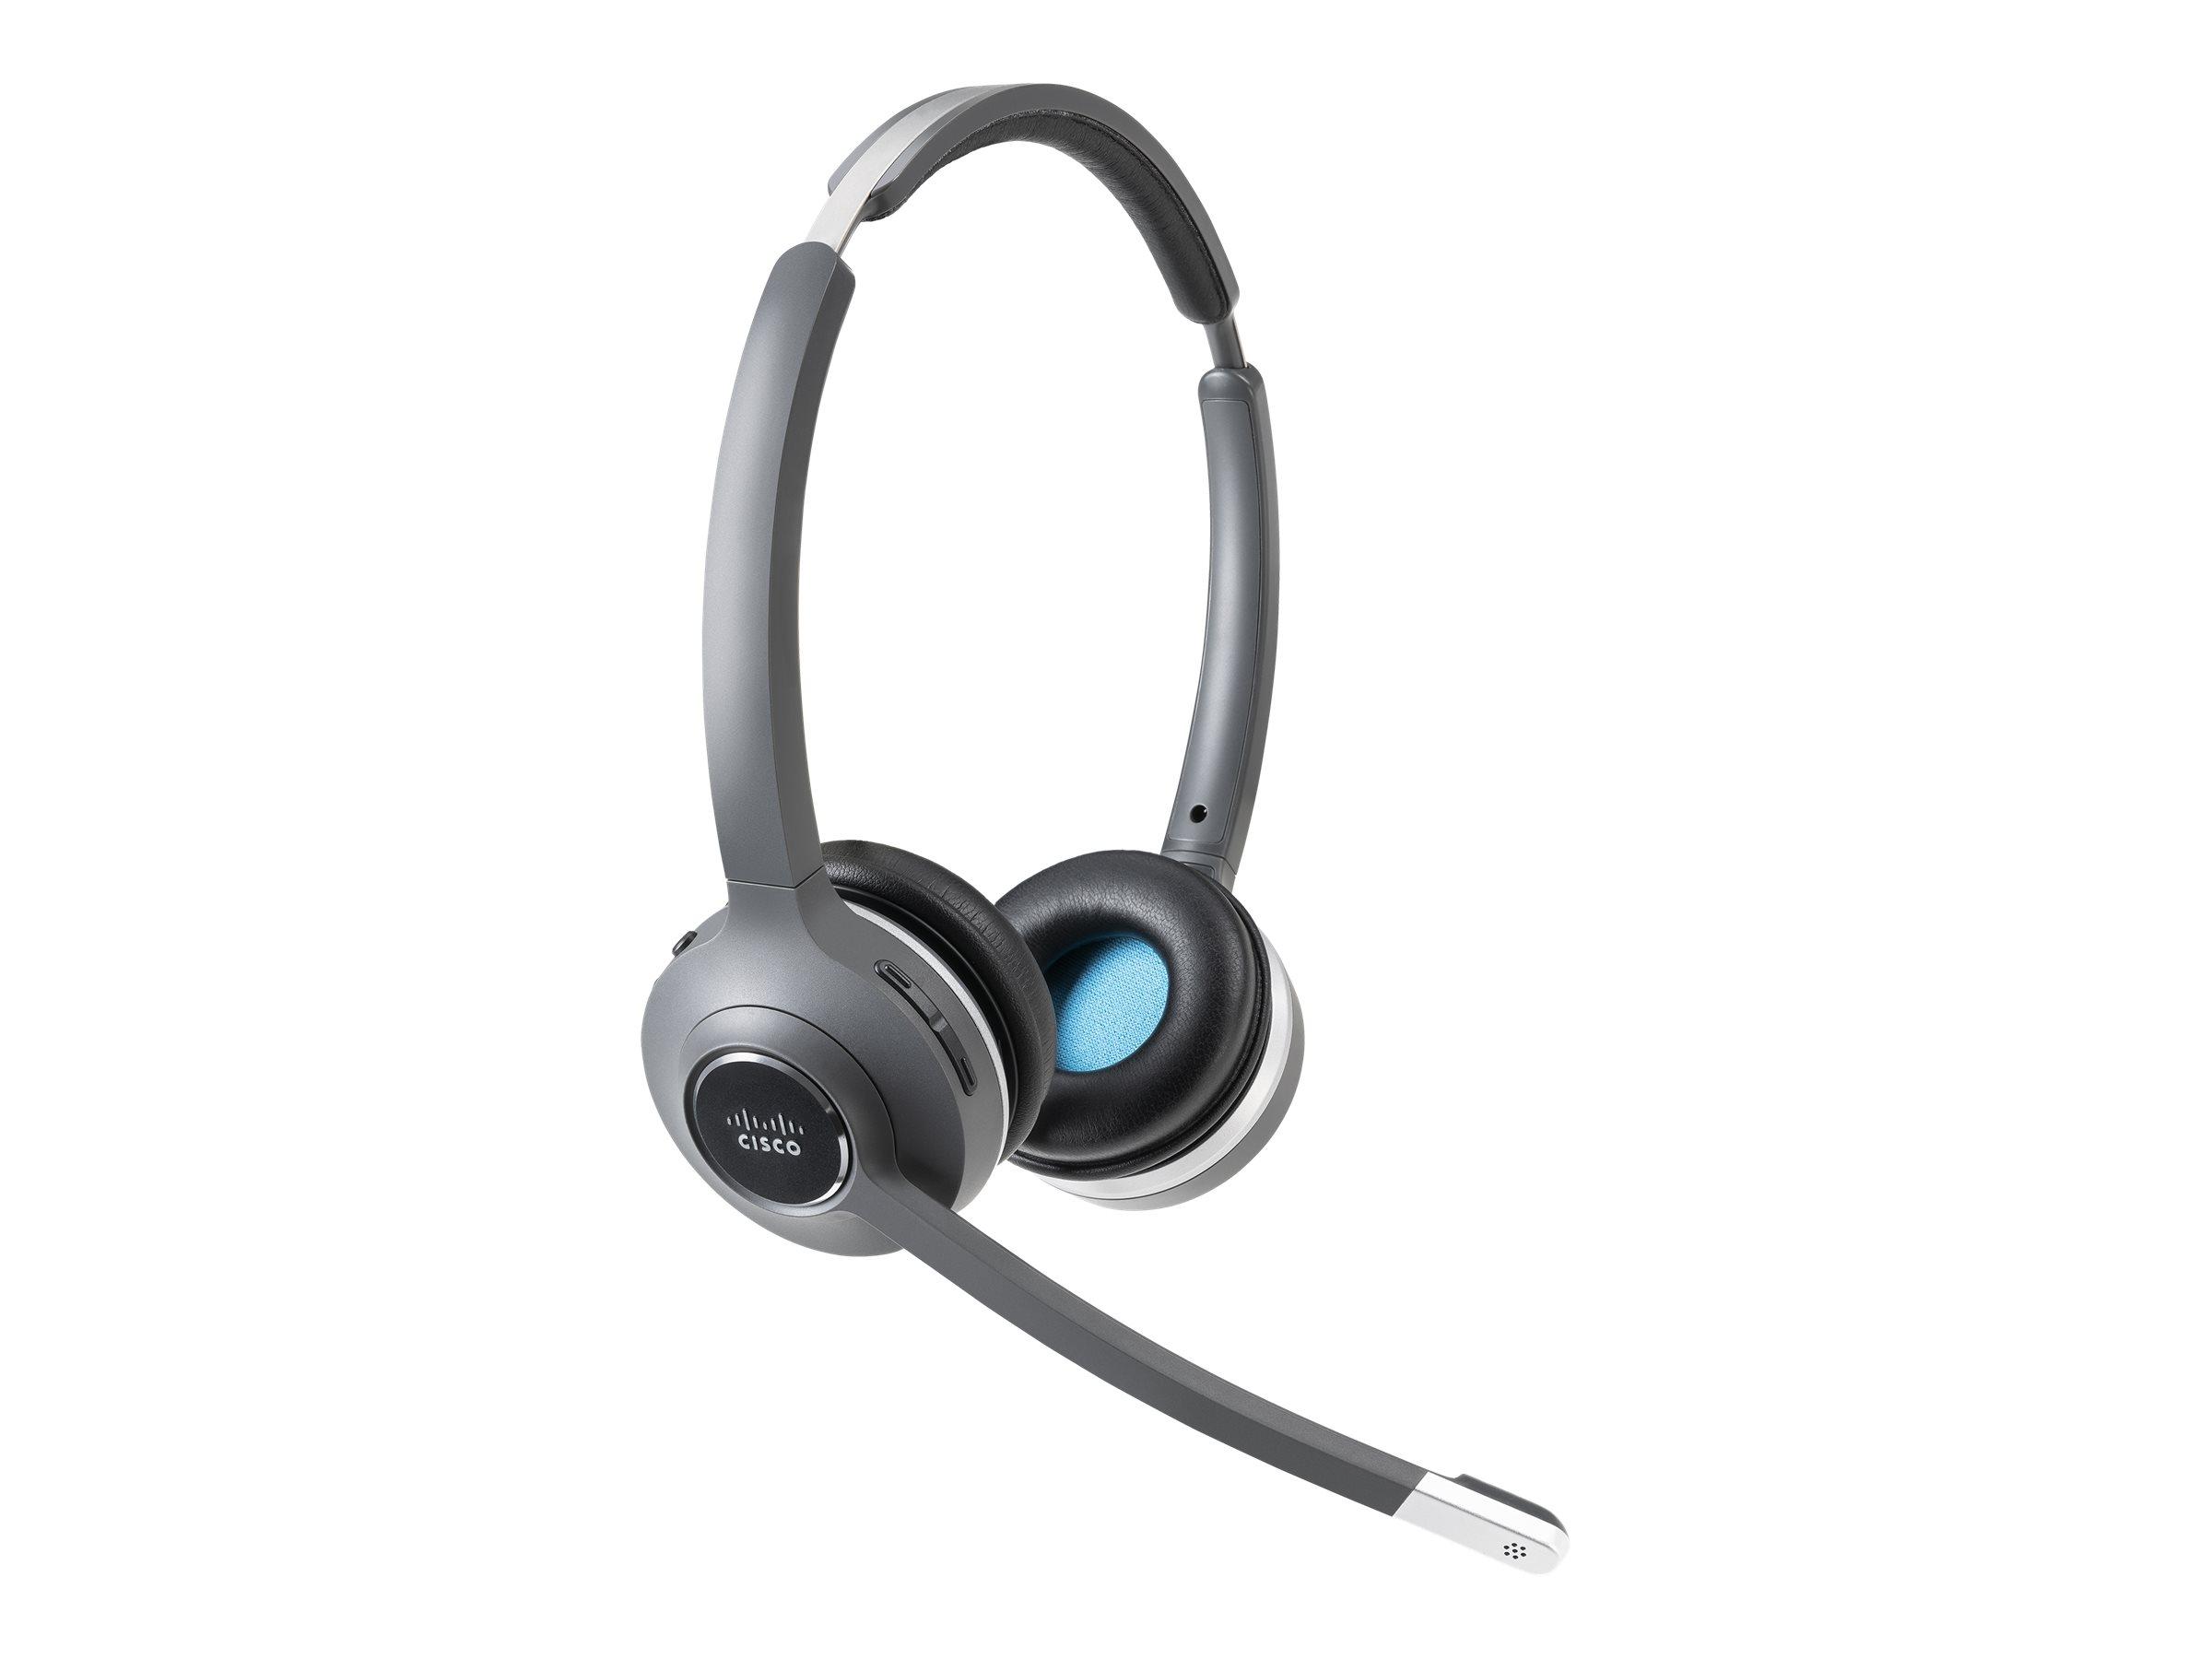 Cisco 562 Wireless Dual - Headset - On-Ear - DECT